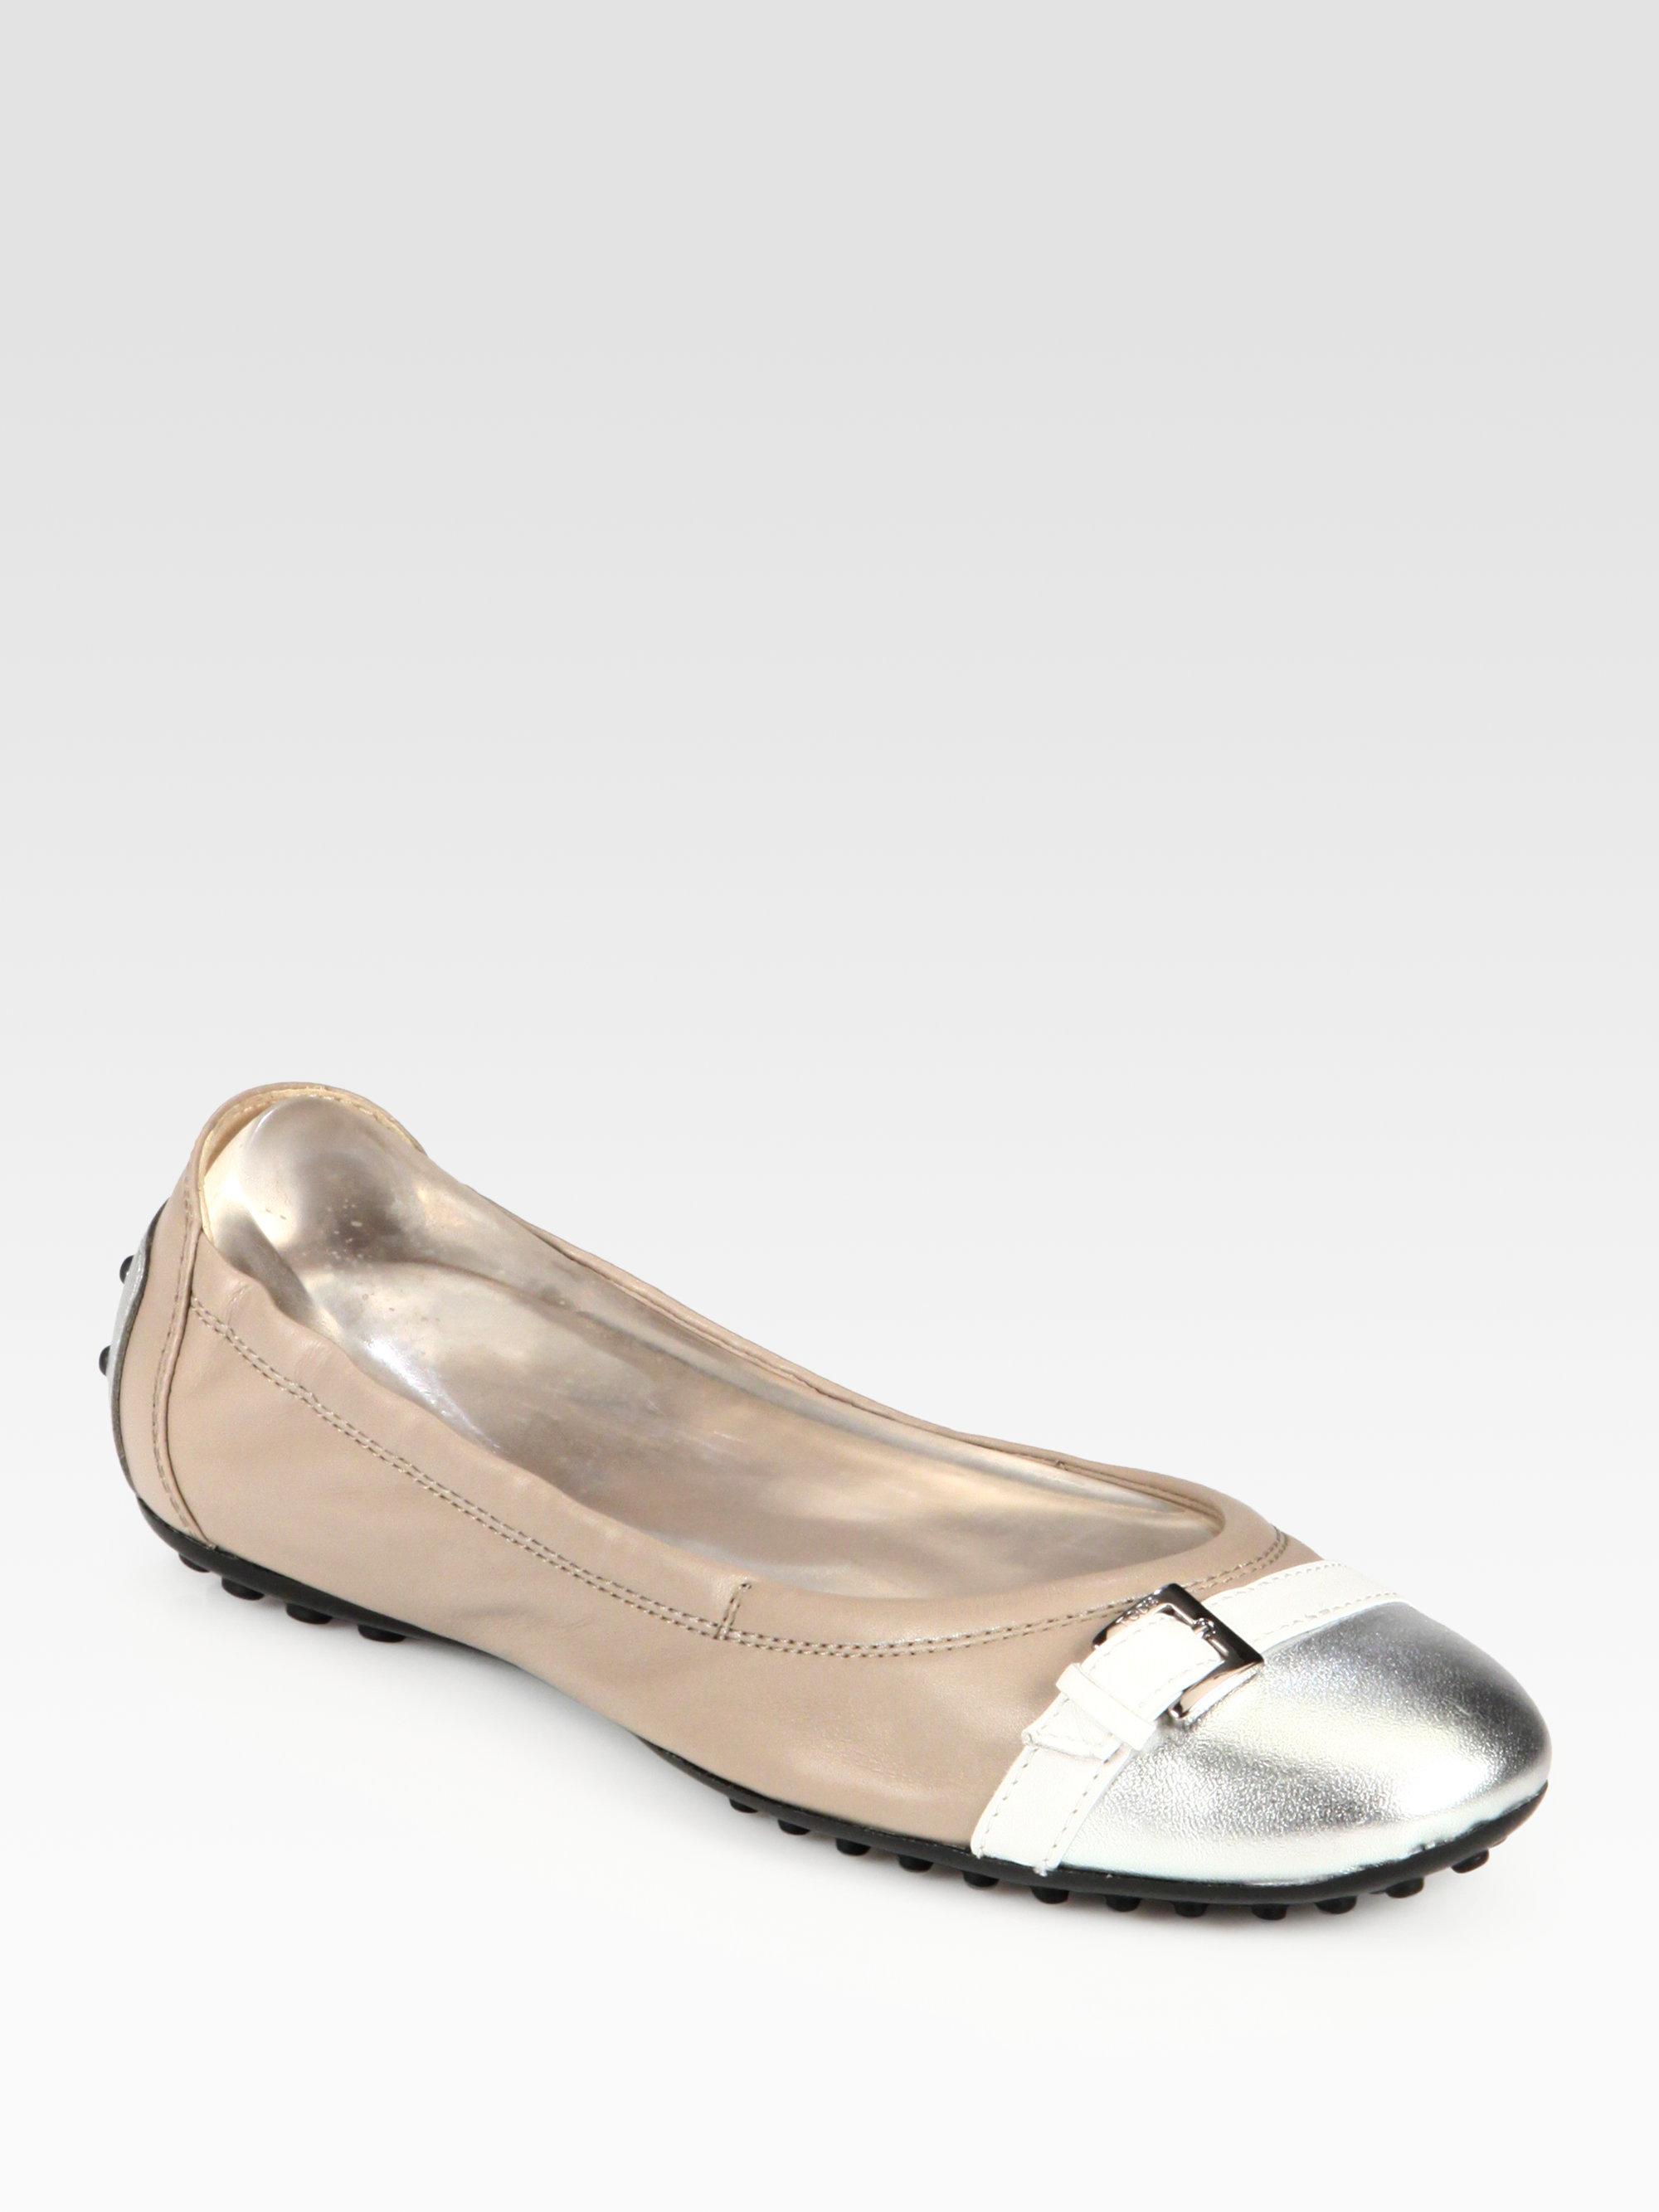 Tod's Metallic Ballerina Flats free shipping amazon GHatVsdH06